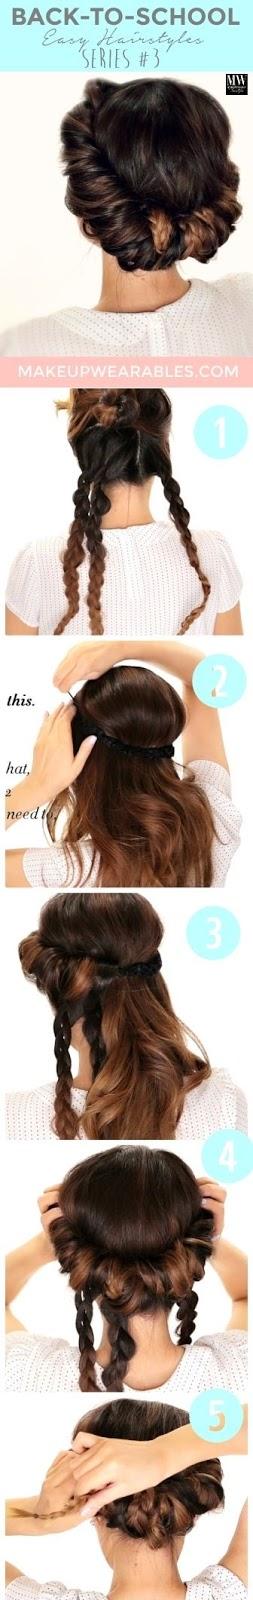 Minute Braided Headband Updo Hairstyle